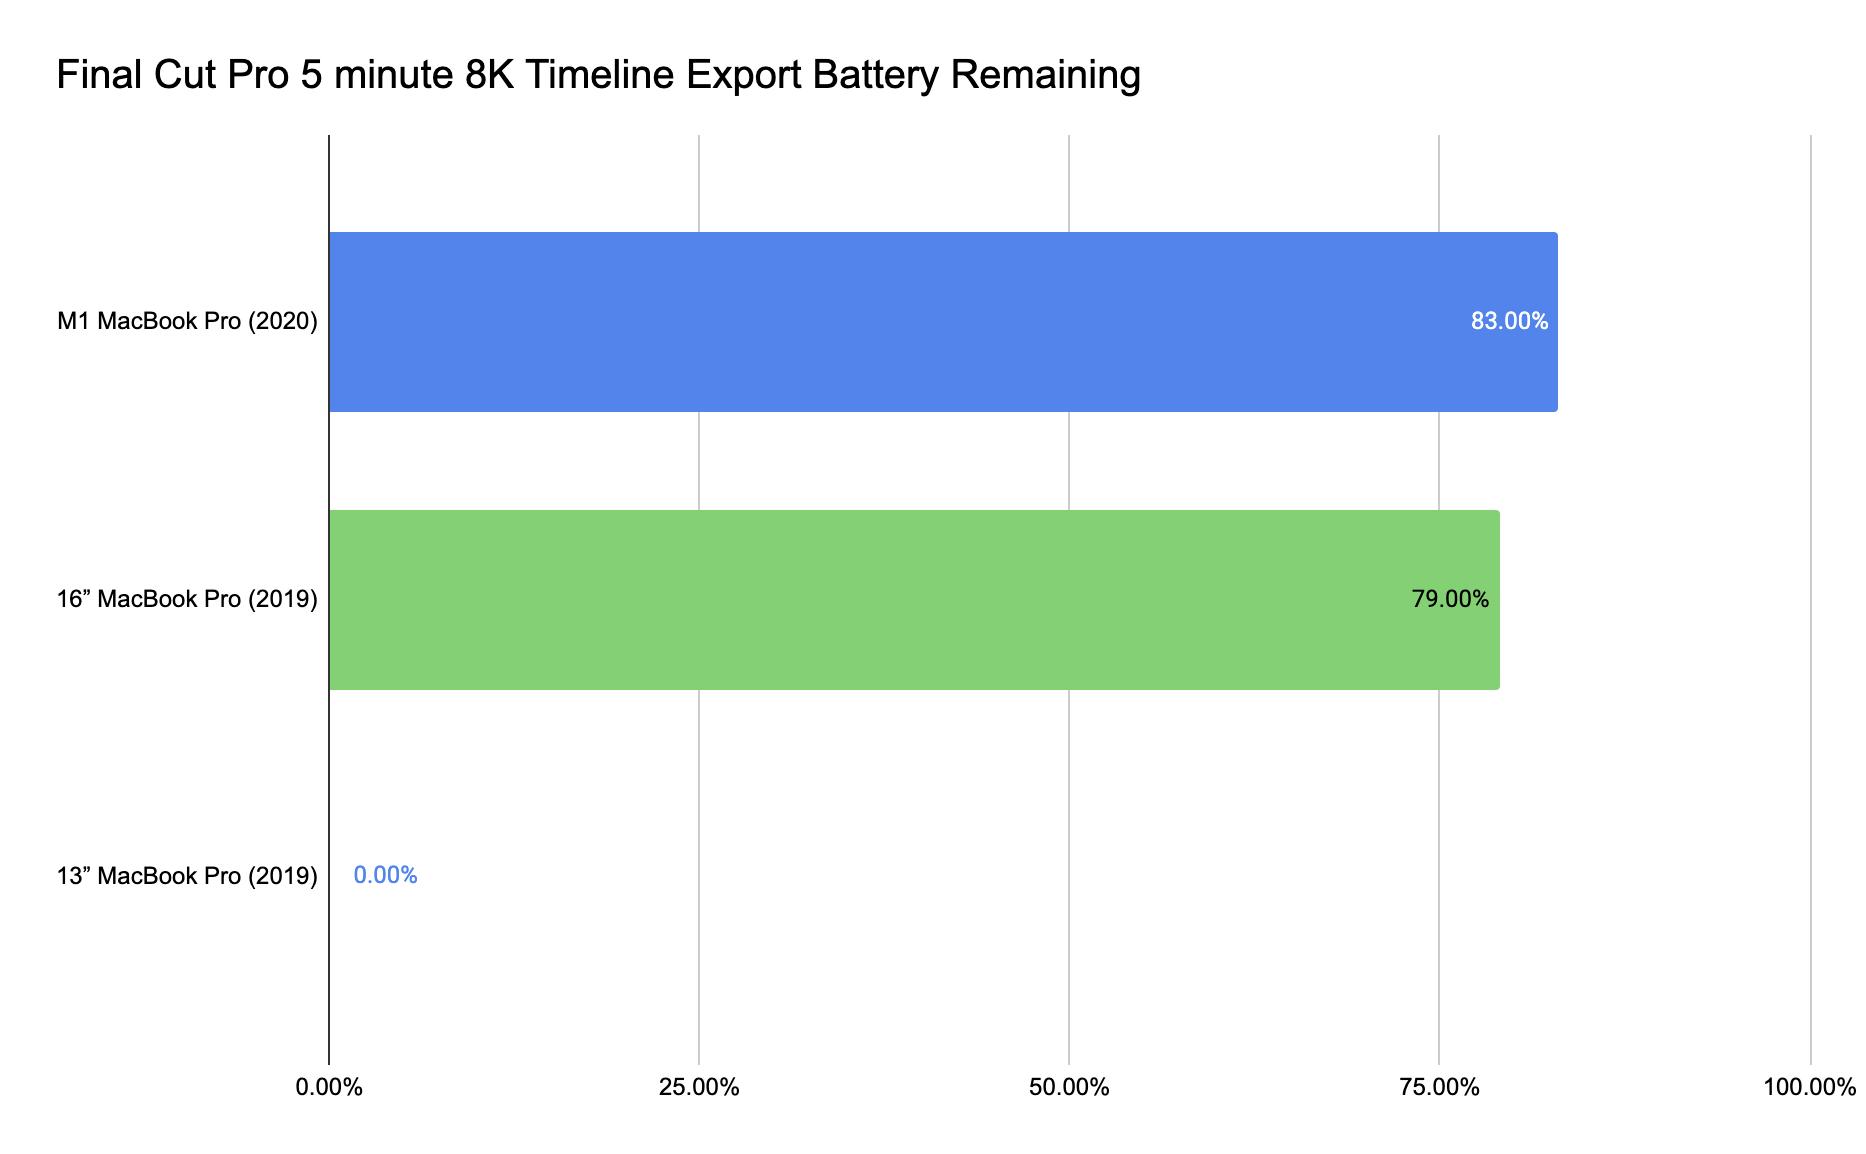 Final Cut Pro 5 minute 8K Timeline Export Battery Remaining